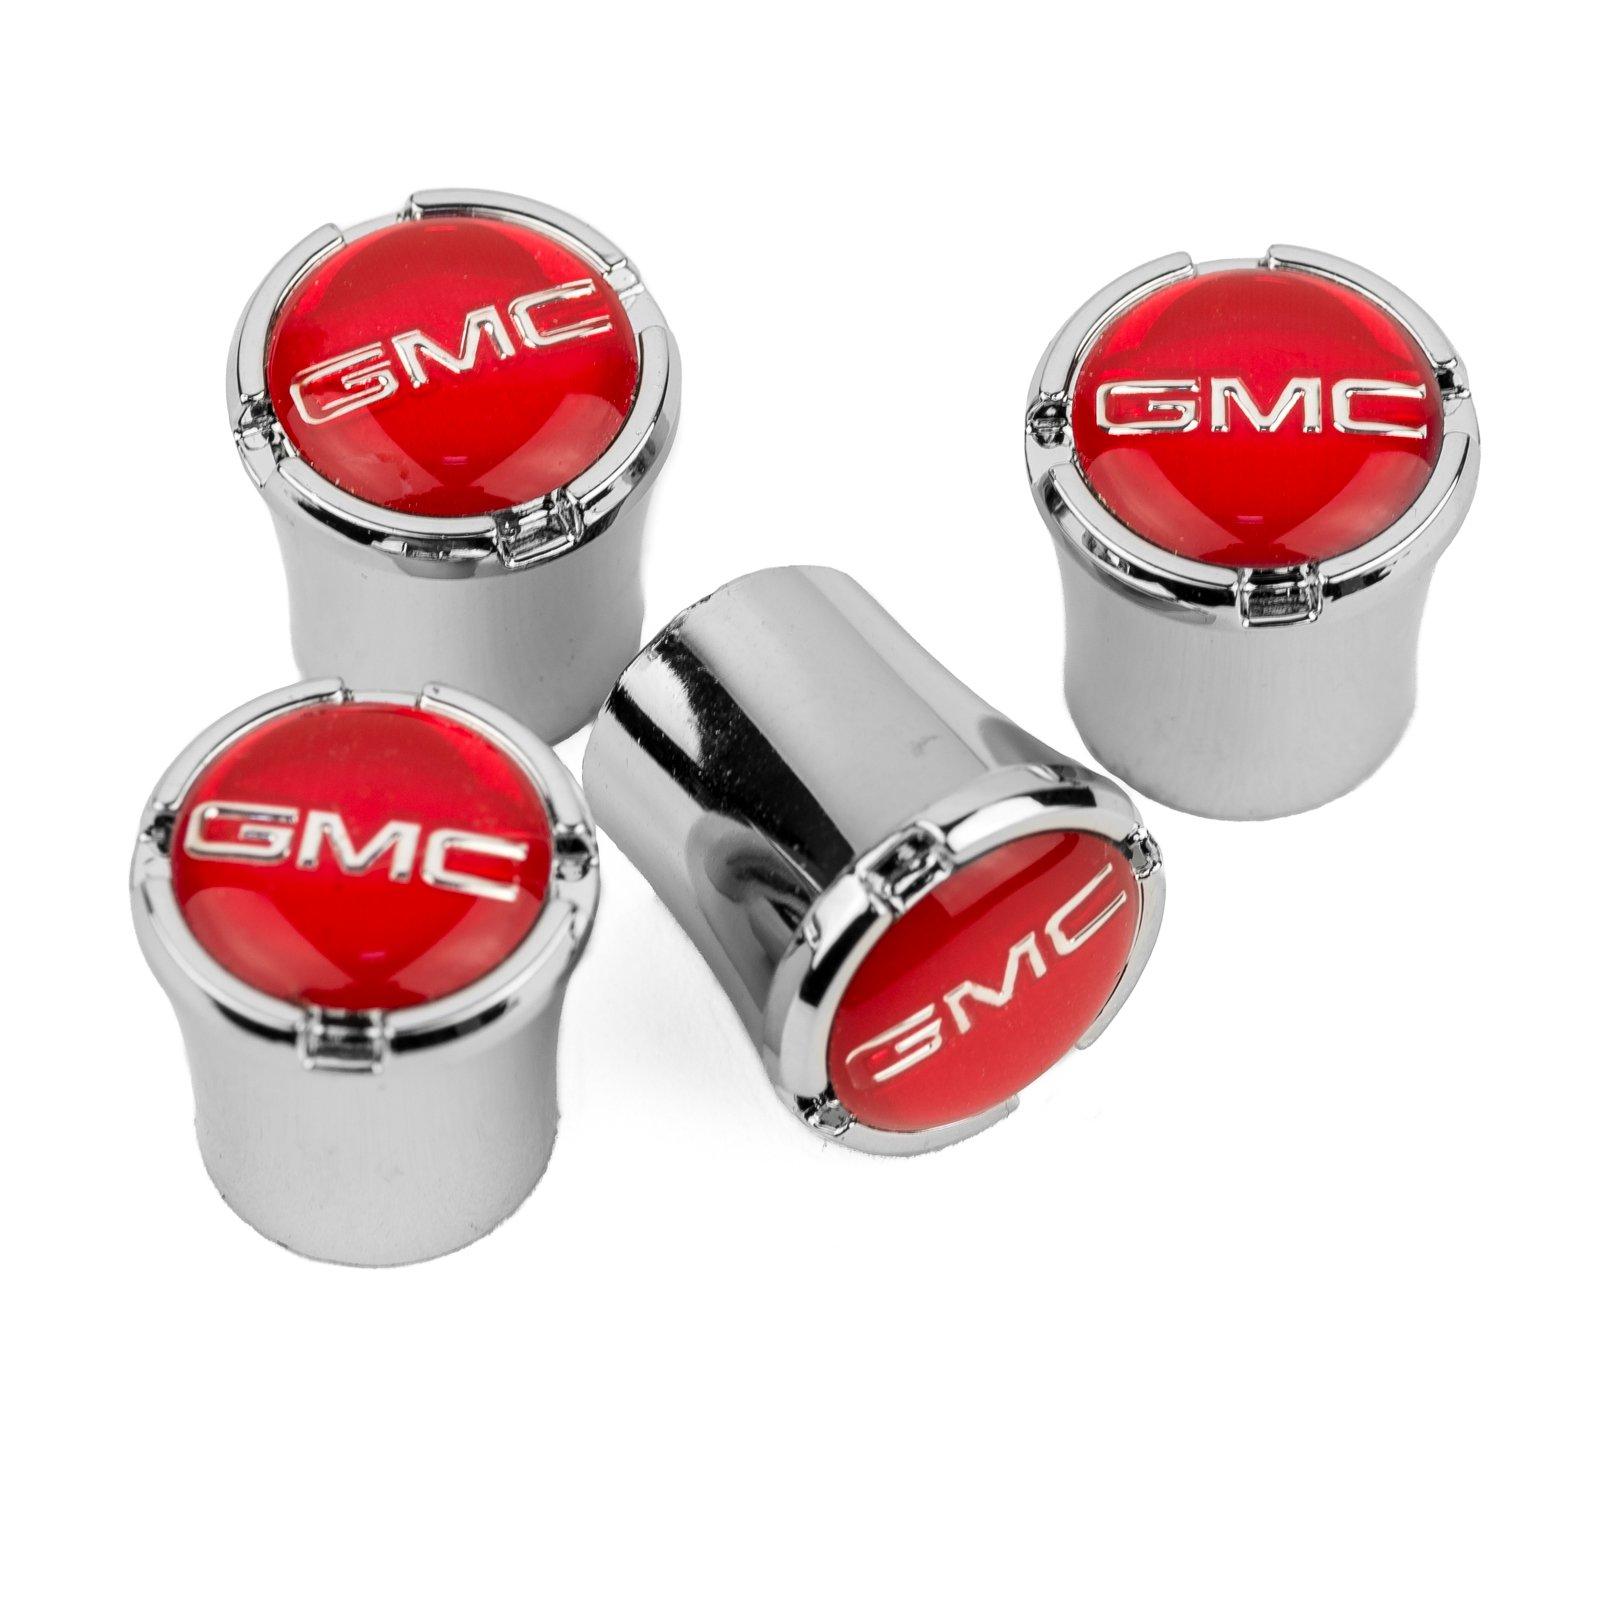 GMC Tire Valve Stem Caps - RED Logo - Sierra - Yukon - Acadia - Terrain - Savana - Canyon